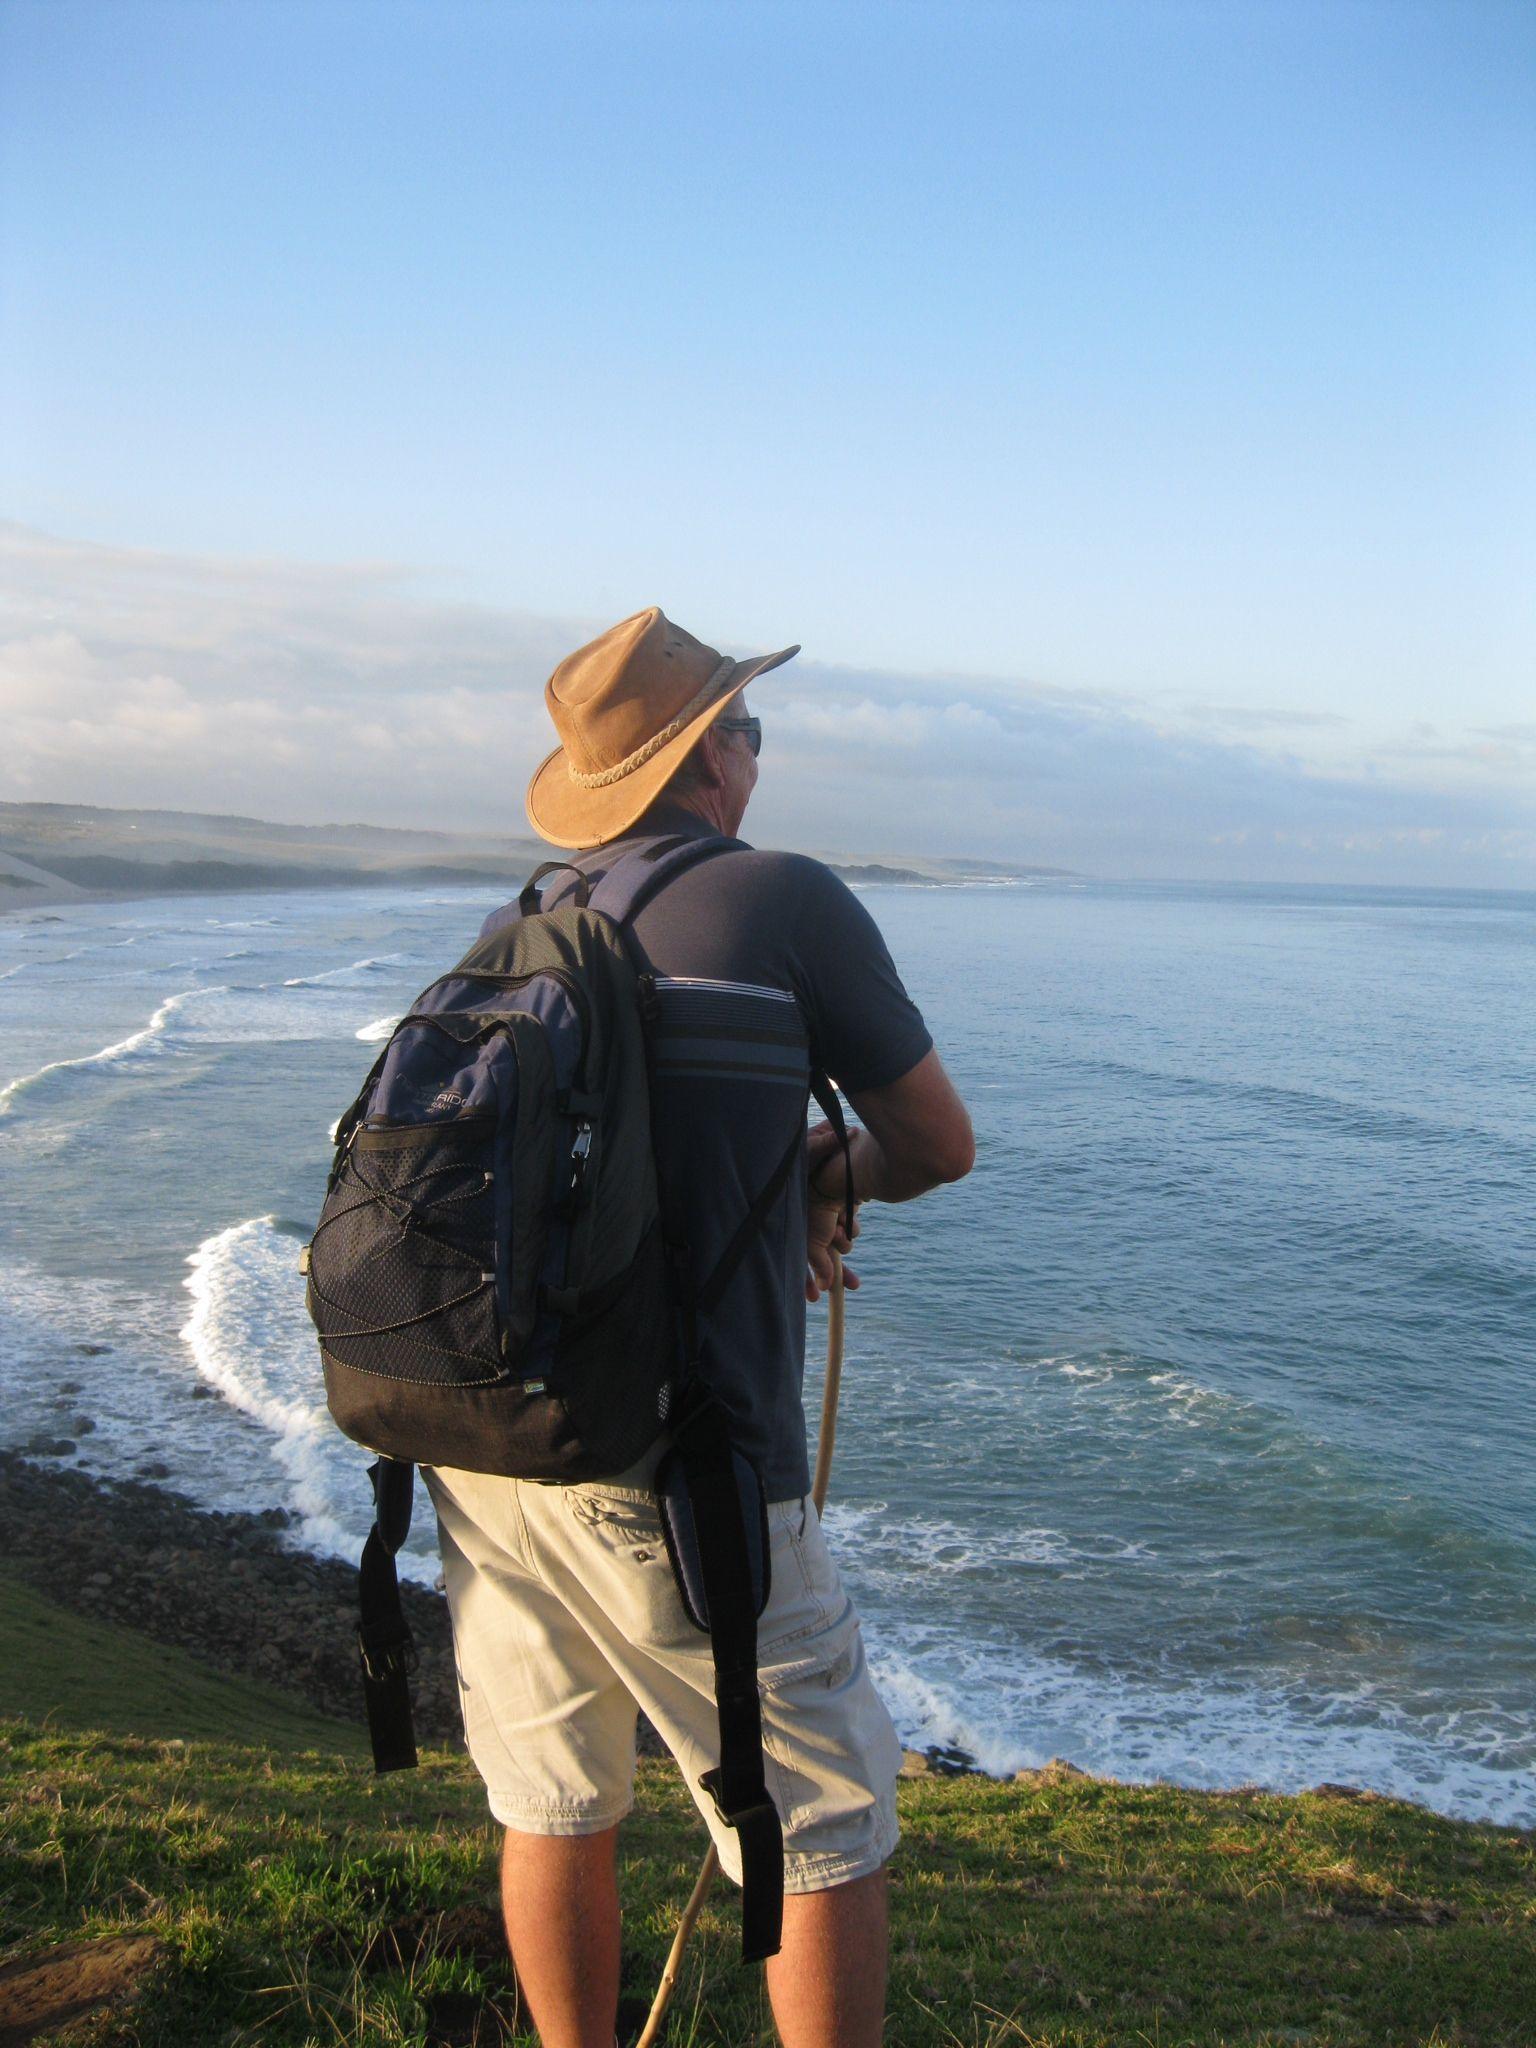 In the Transkei